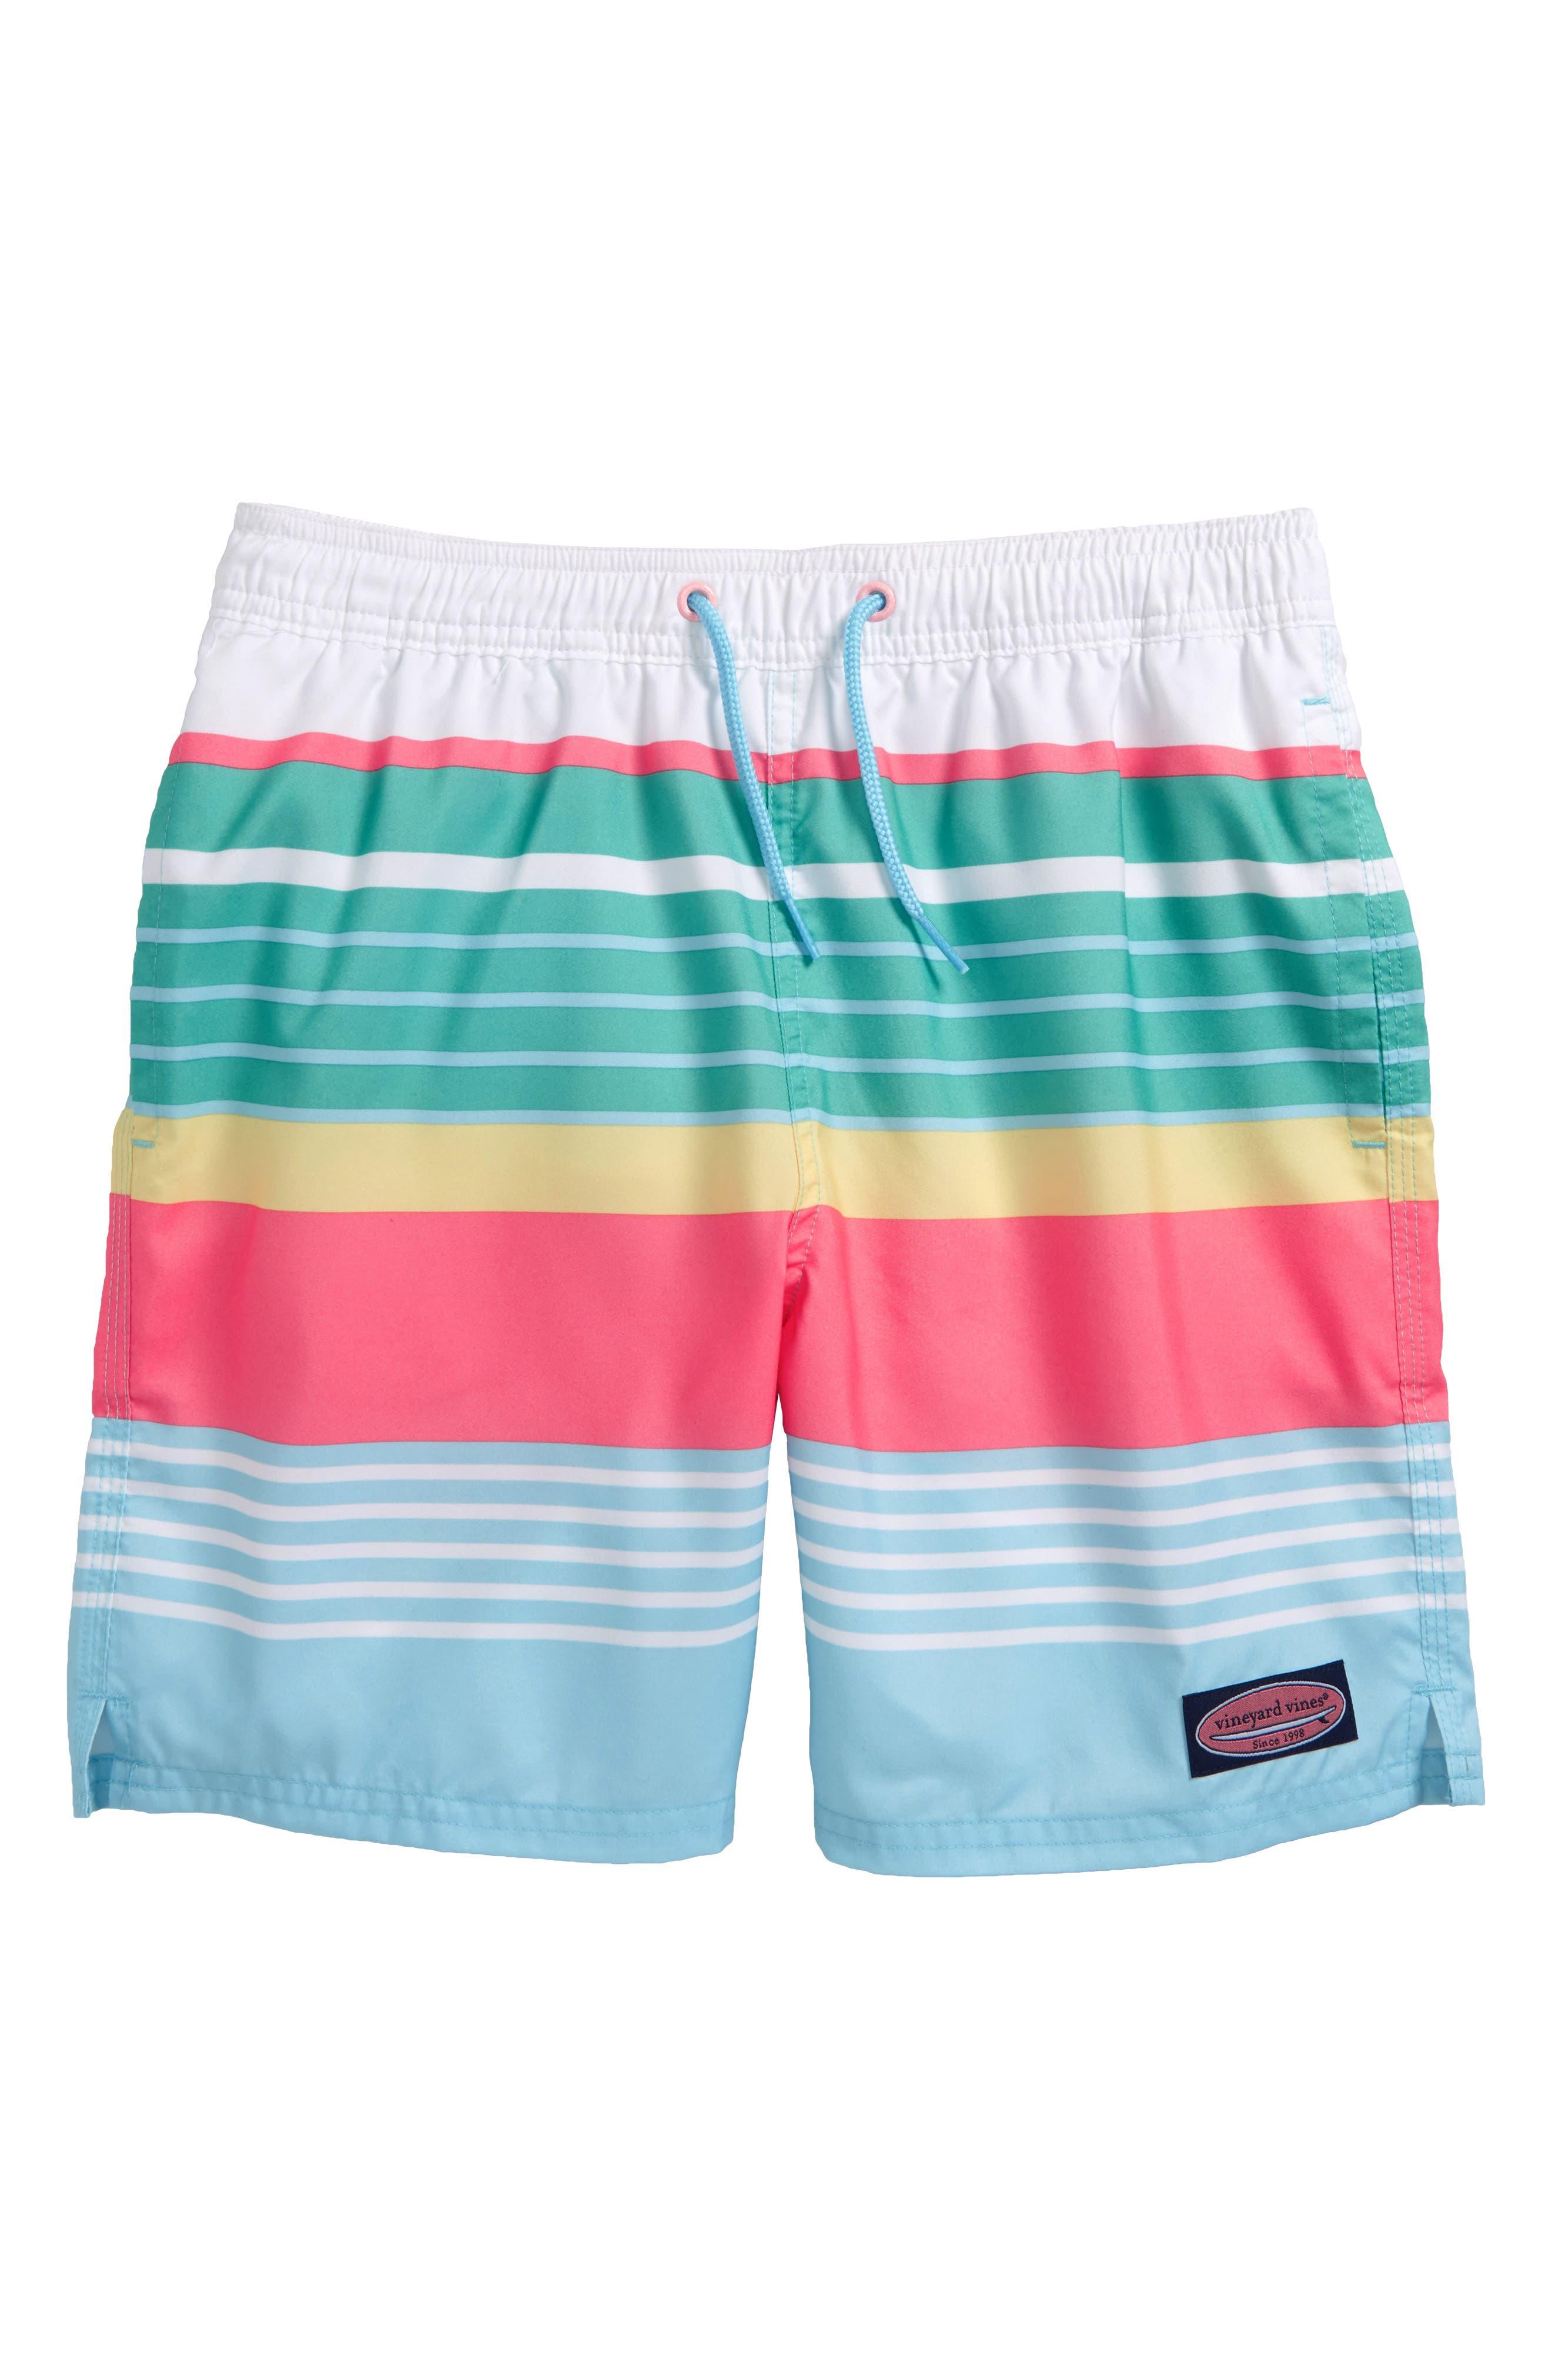 Chappy Boca Bay Stripe Swim Trunks,                             Main thumbnail 1, color,                             422